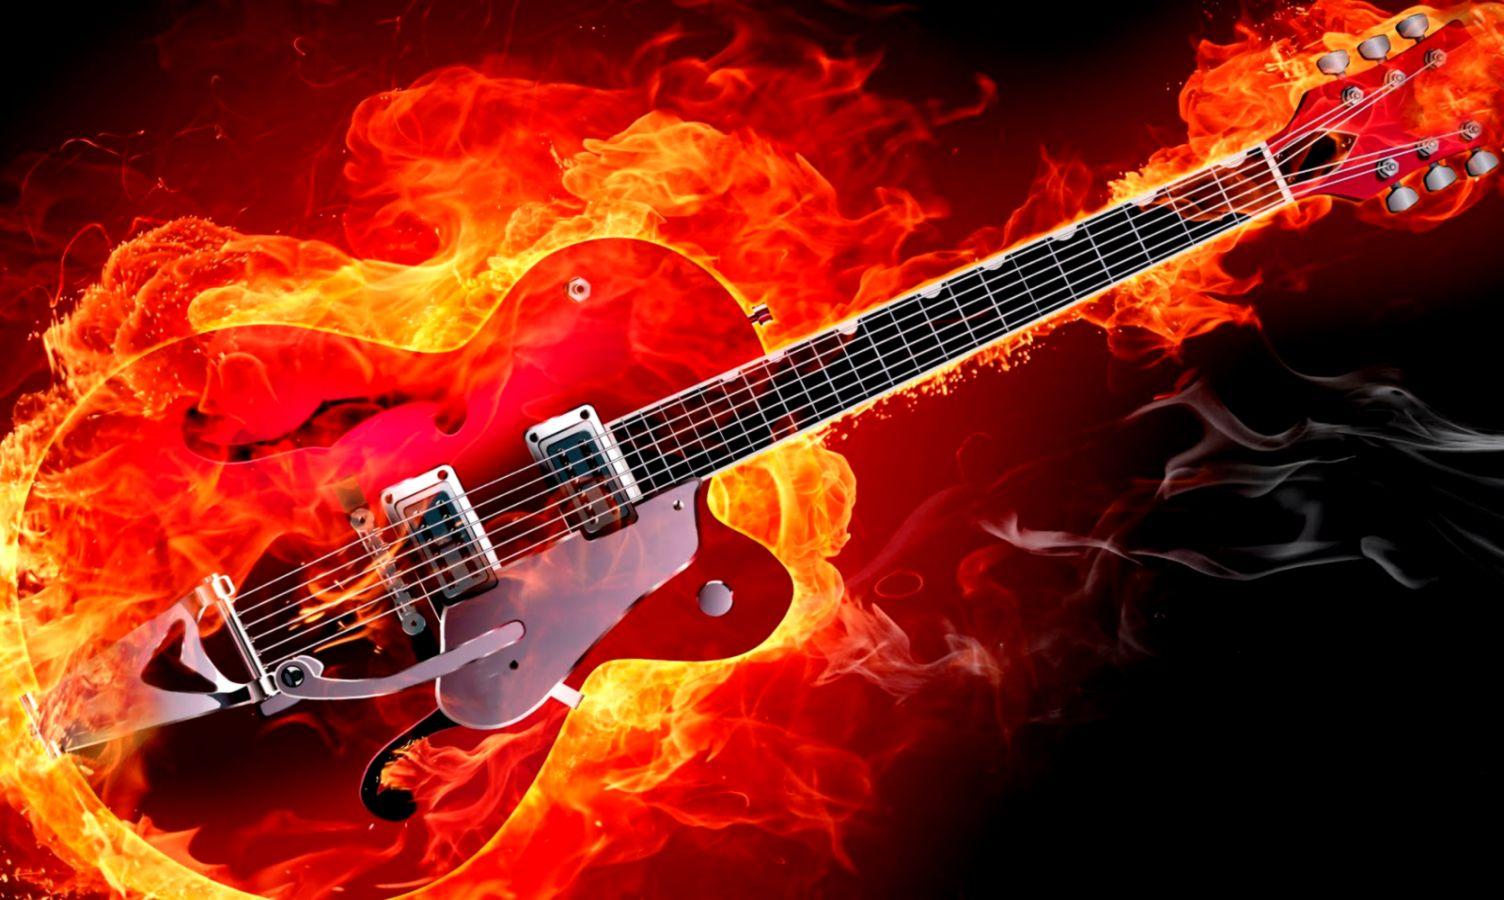 Flames Fire Drums Black Music Hd Wallpaper   Wallpapers Heroes